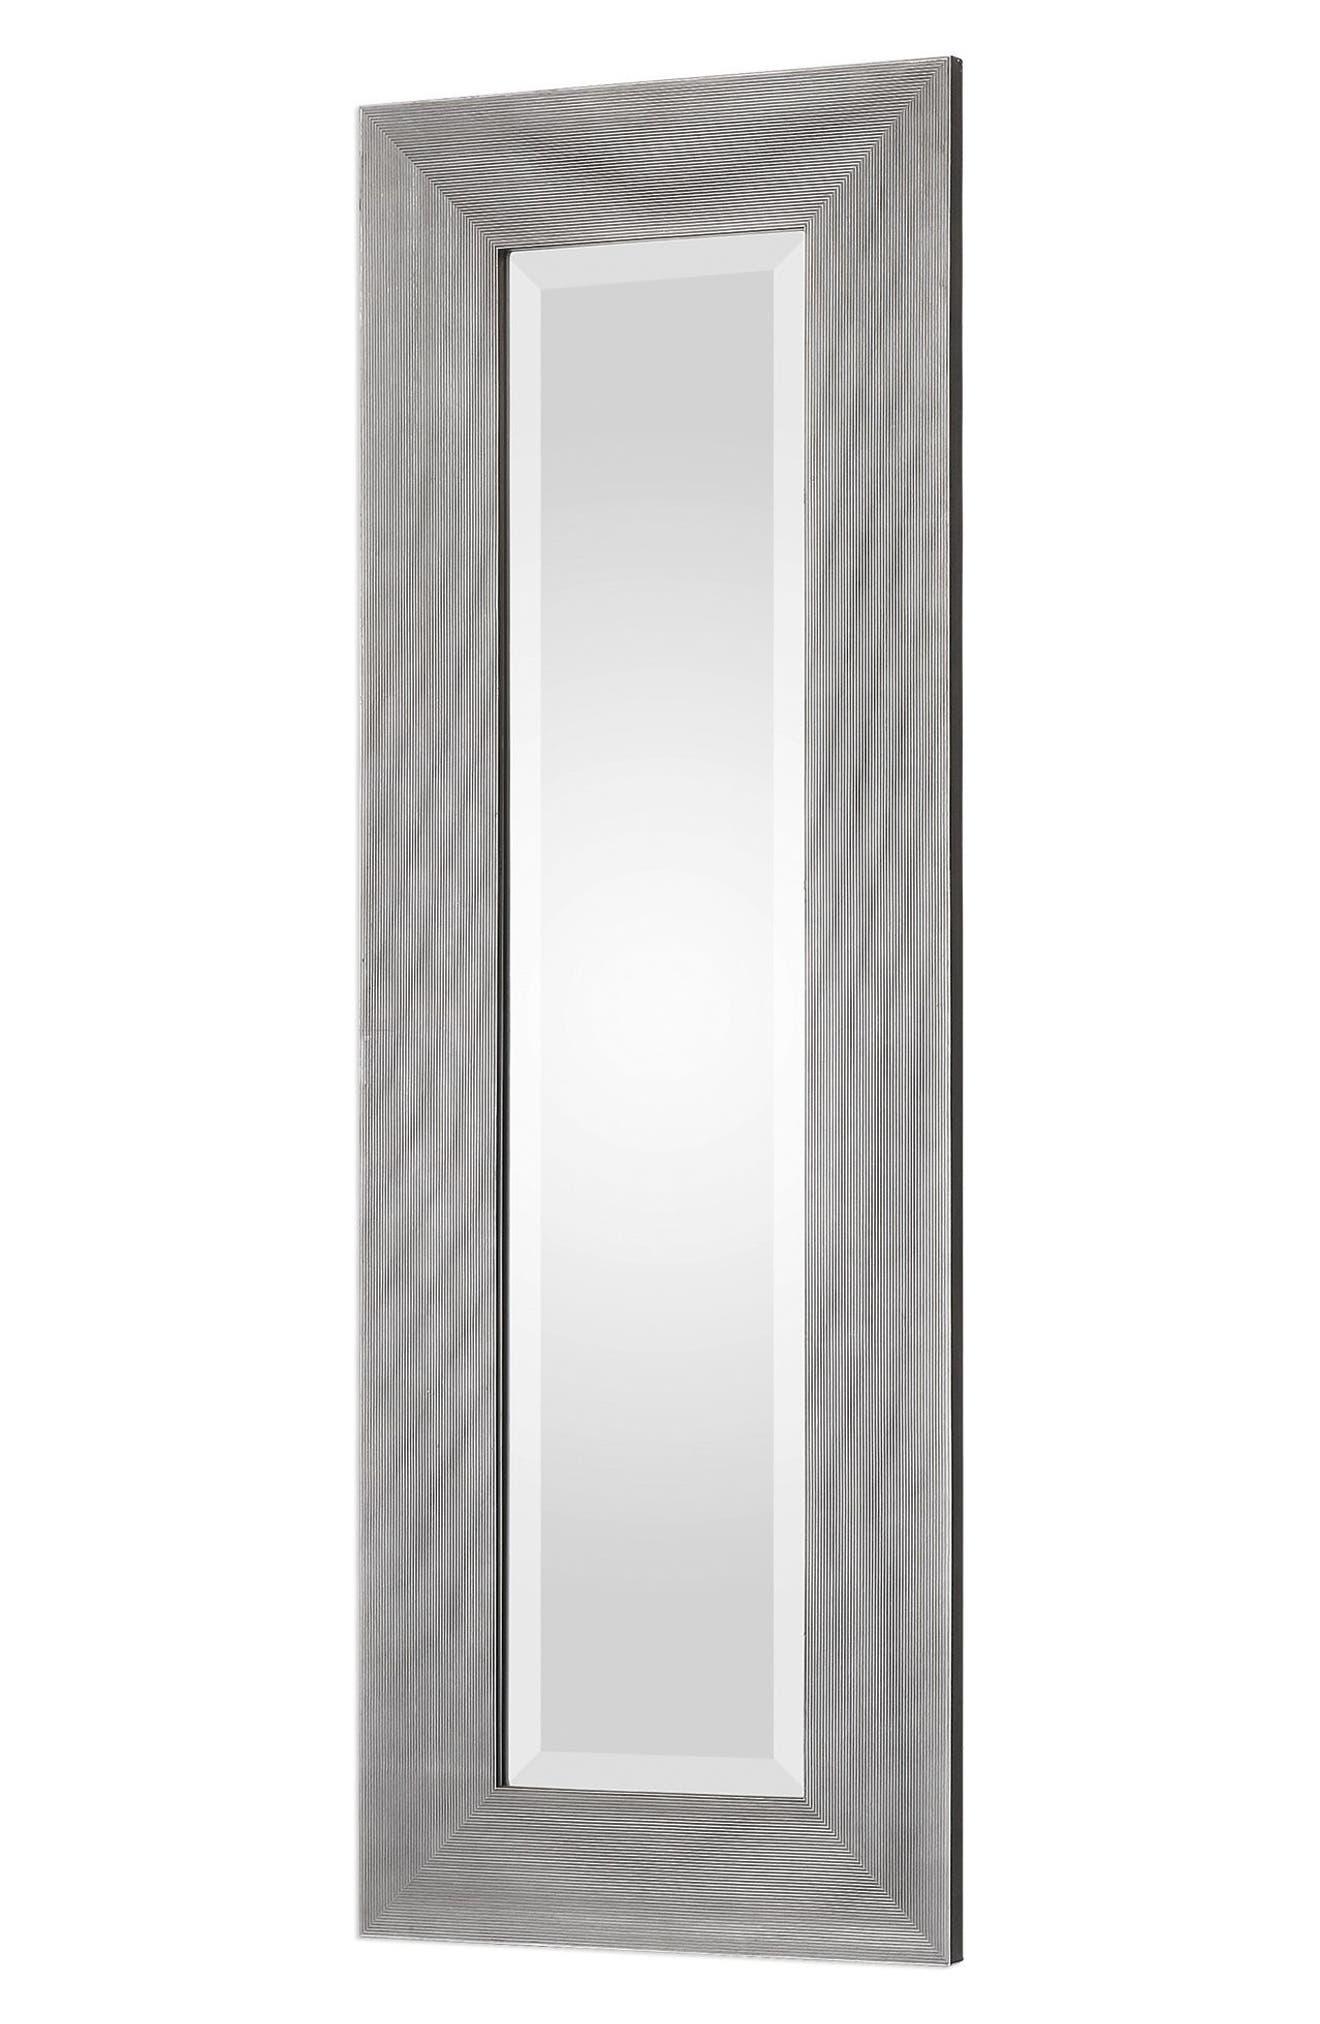 Maldon Set of 2 Wall Mirrors,                             Alternate thumbnail 3, color,                             Metallic Silver